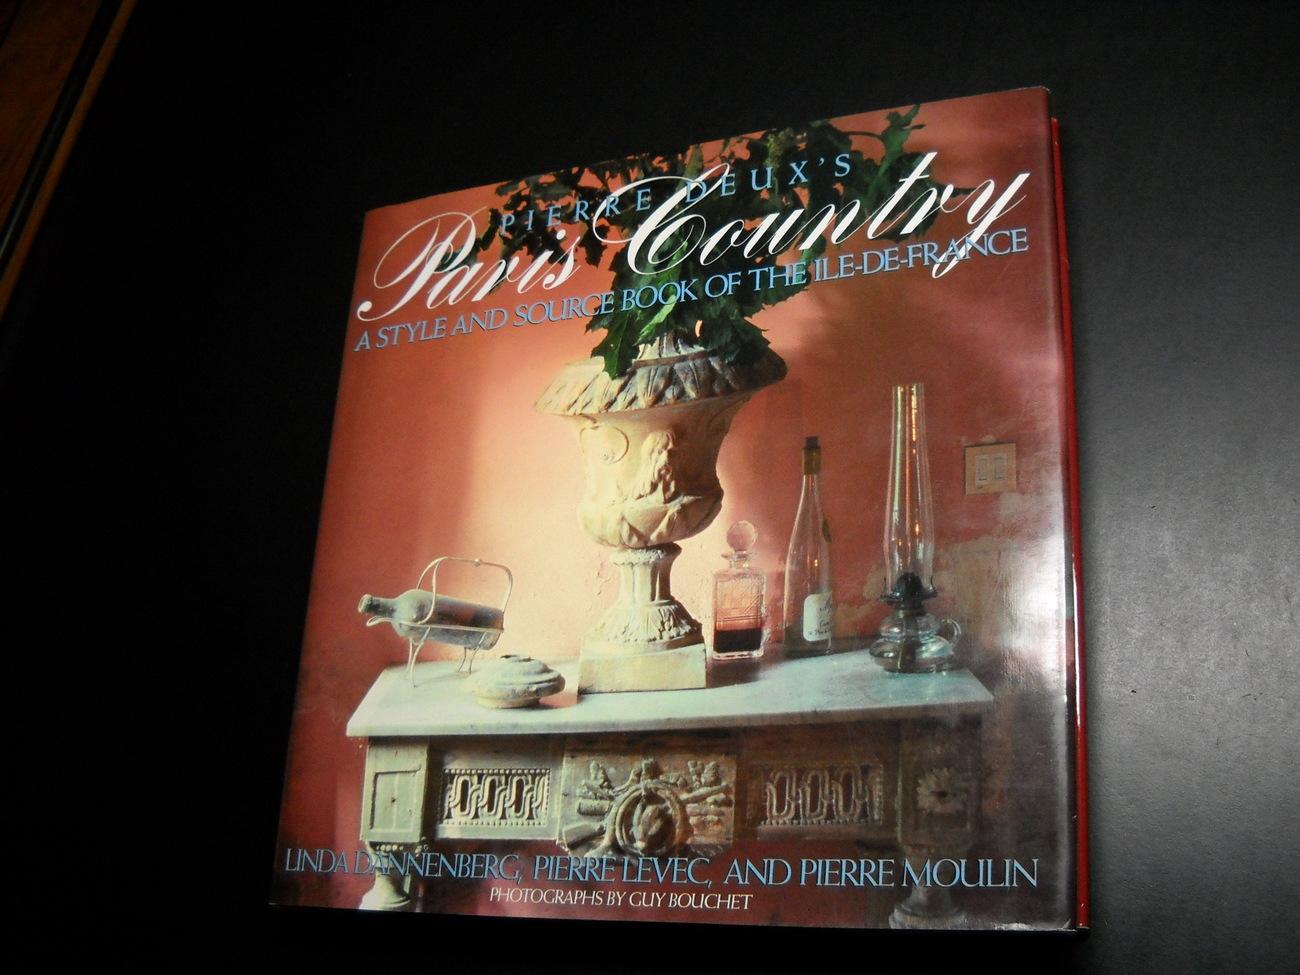 Book dannenberg pierre deux s paris country hcdj 1991 first edition 01